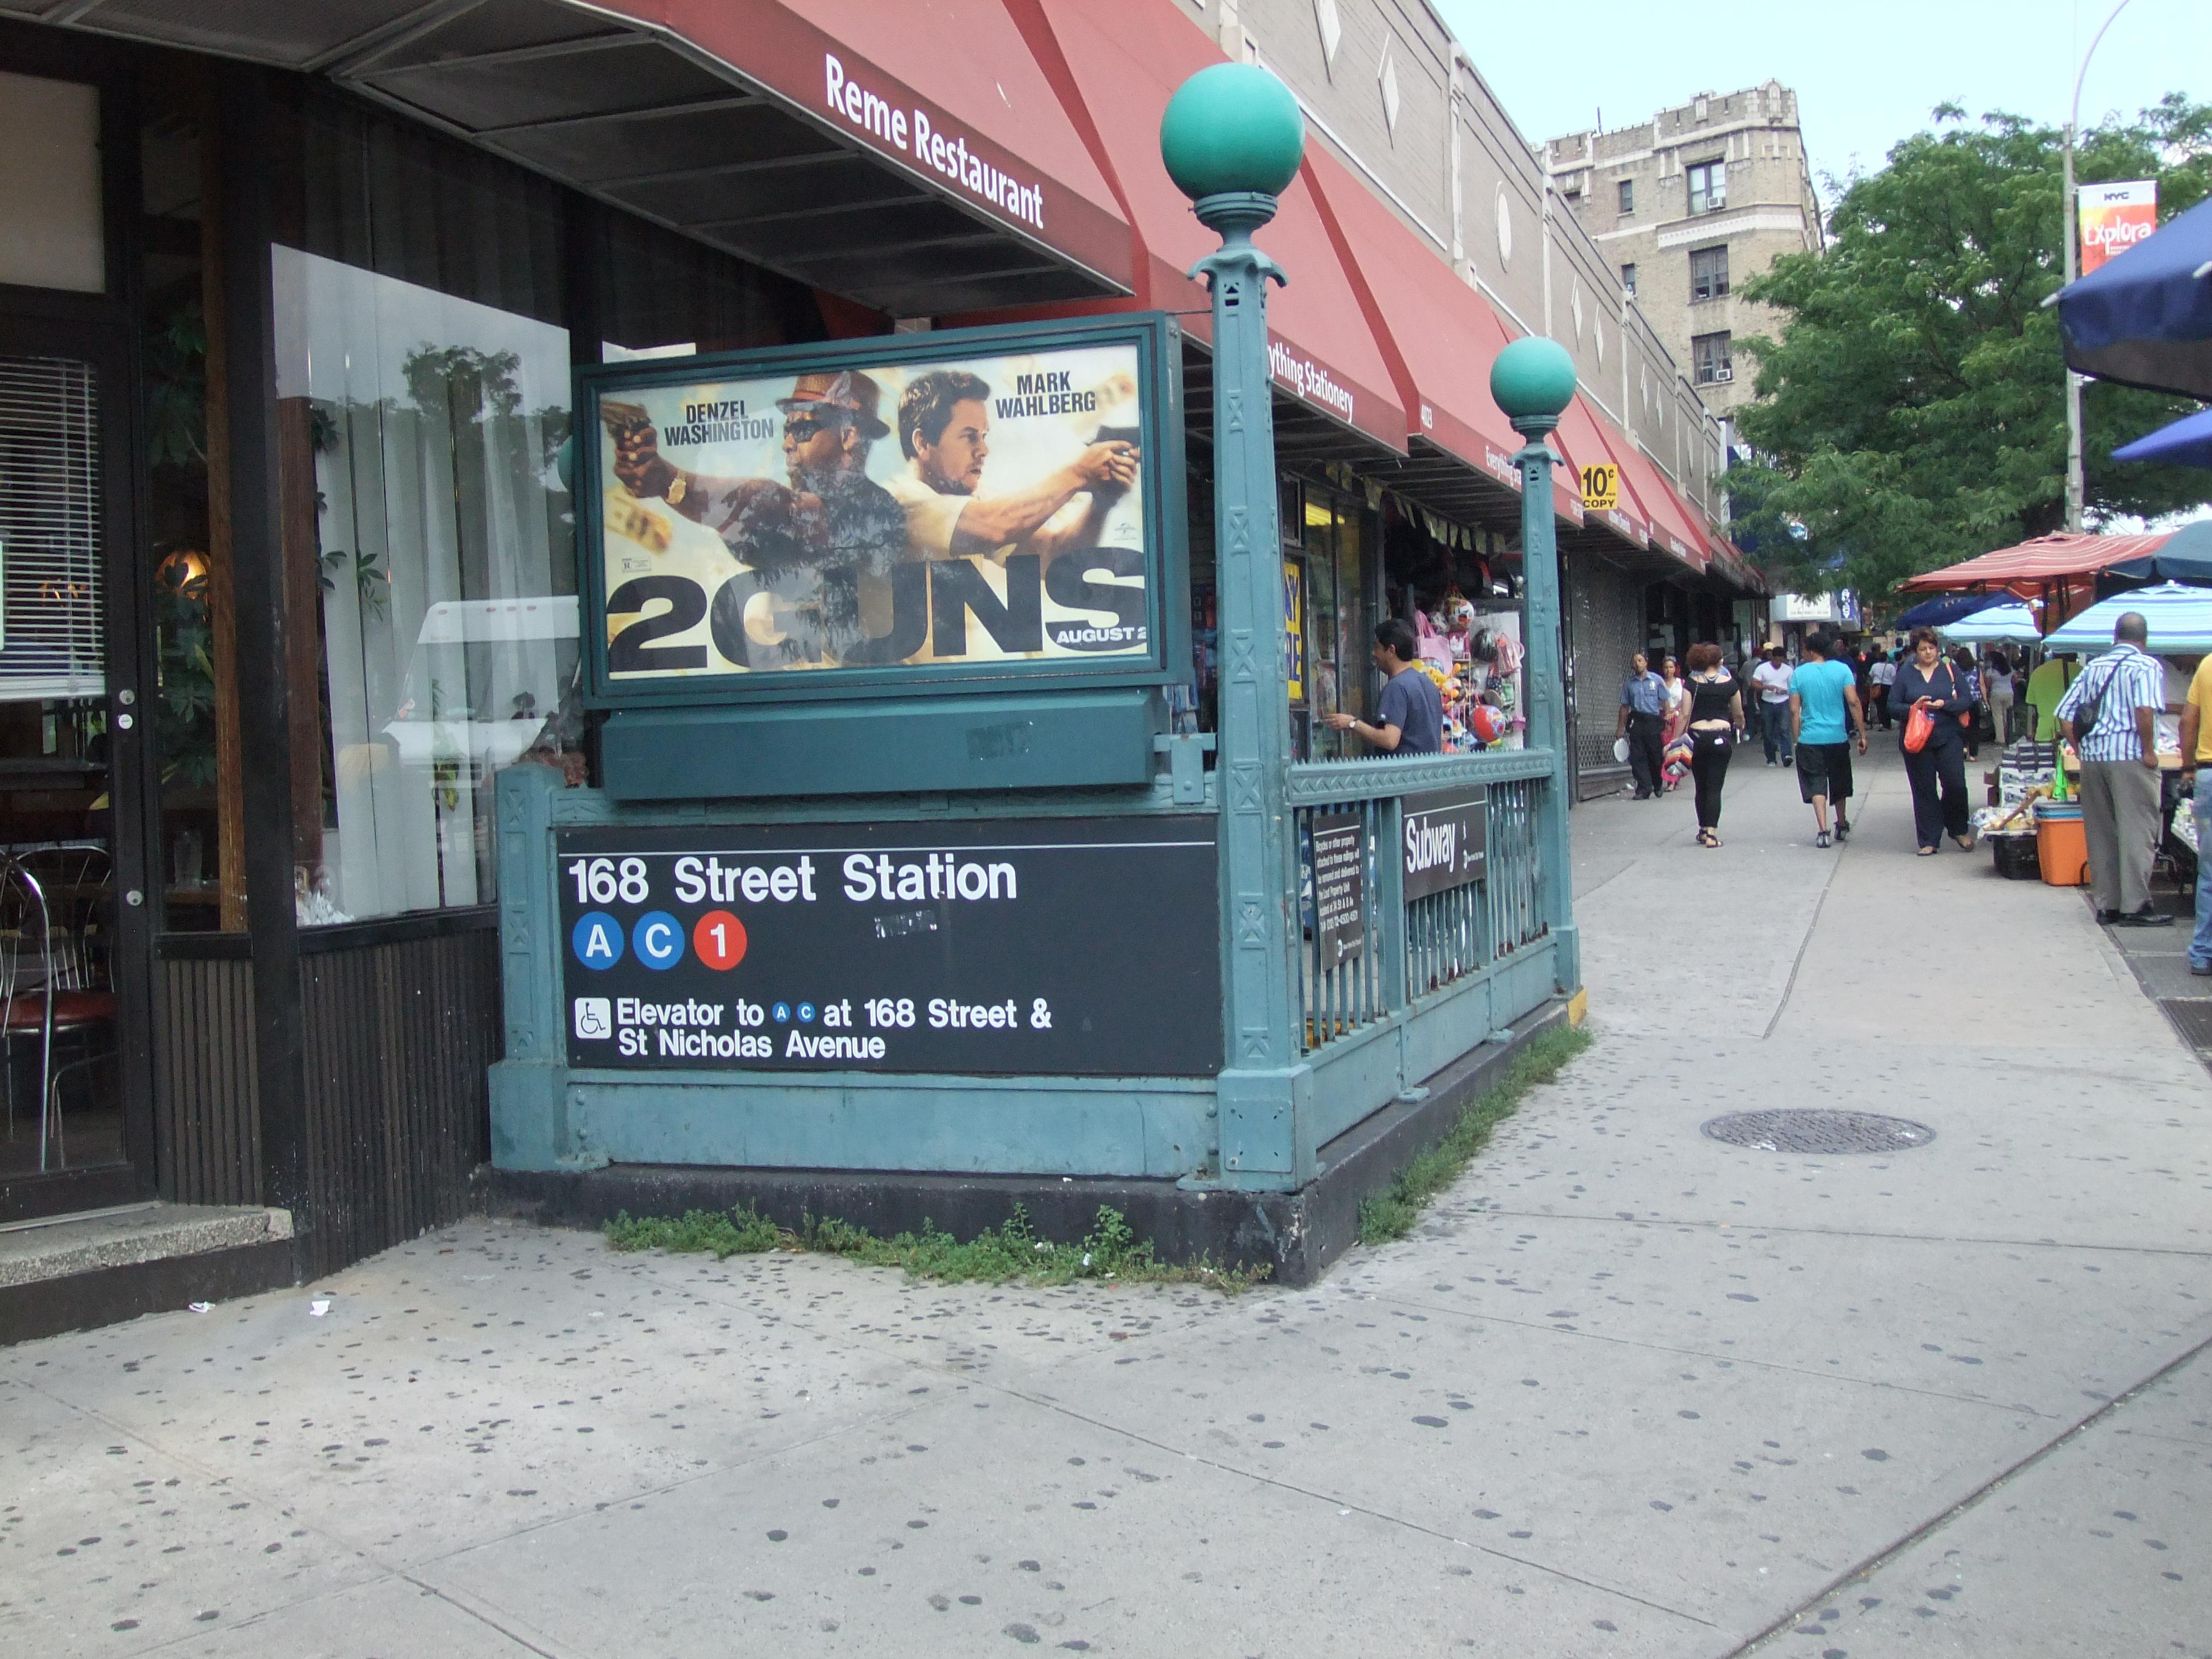 Washington Heights Subway Map.168th Street Station New York City Subway Wikipedia